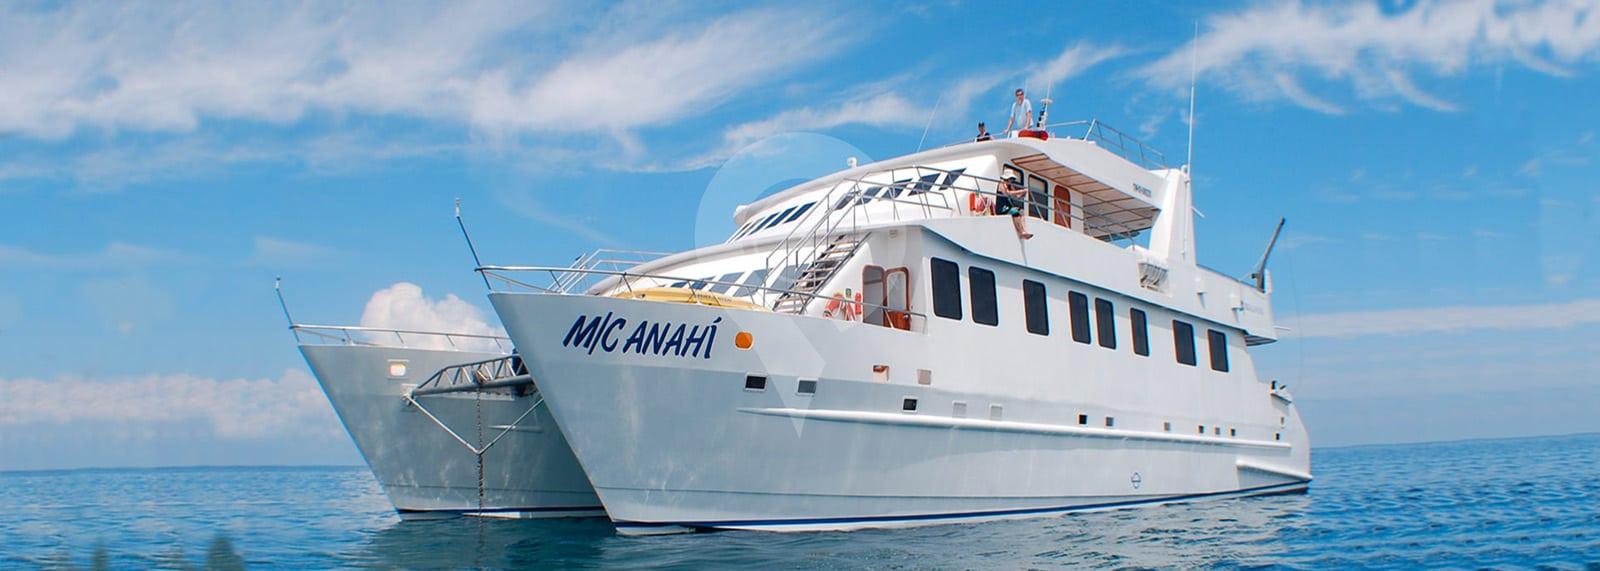 Catamaran Anahi Galapagos